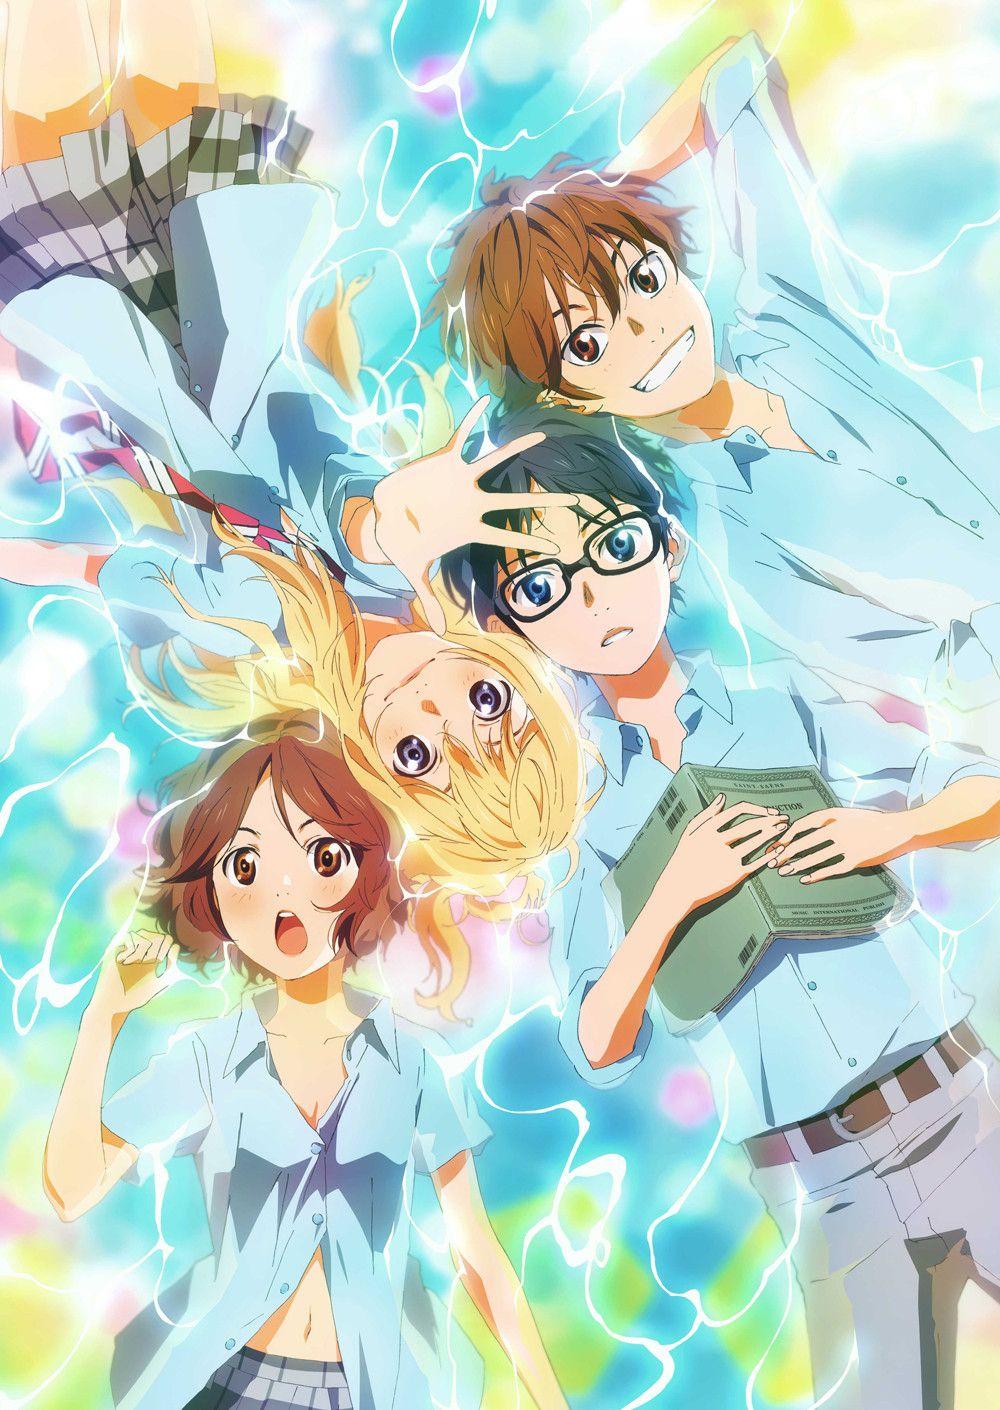 Anime I'm Ashamed I Enjoyed Your lie in april